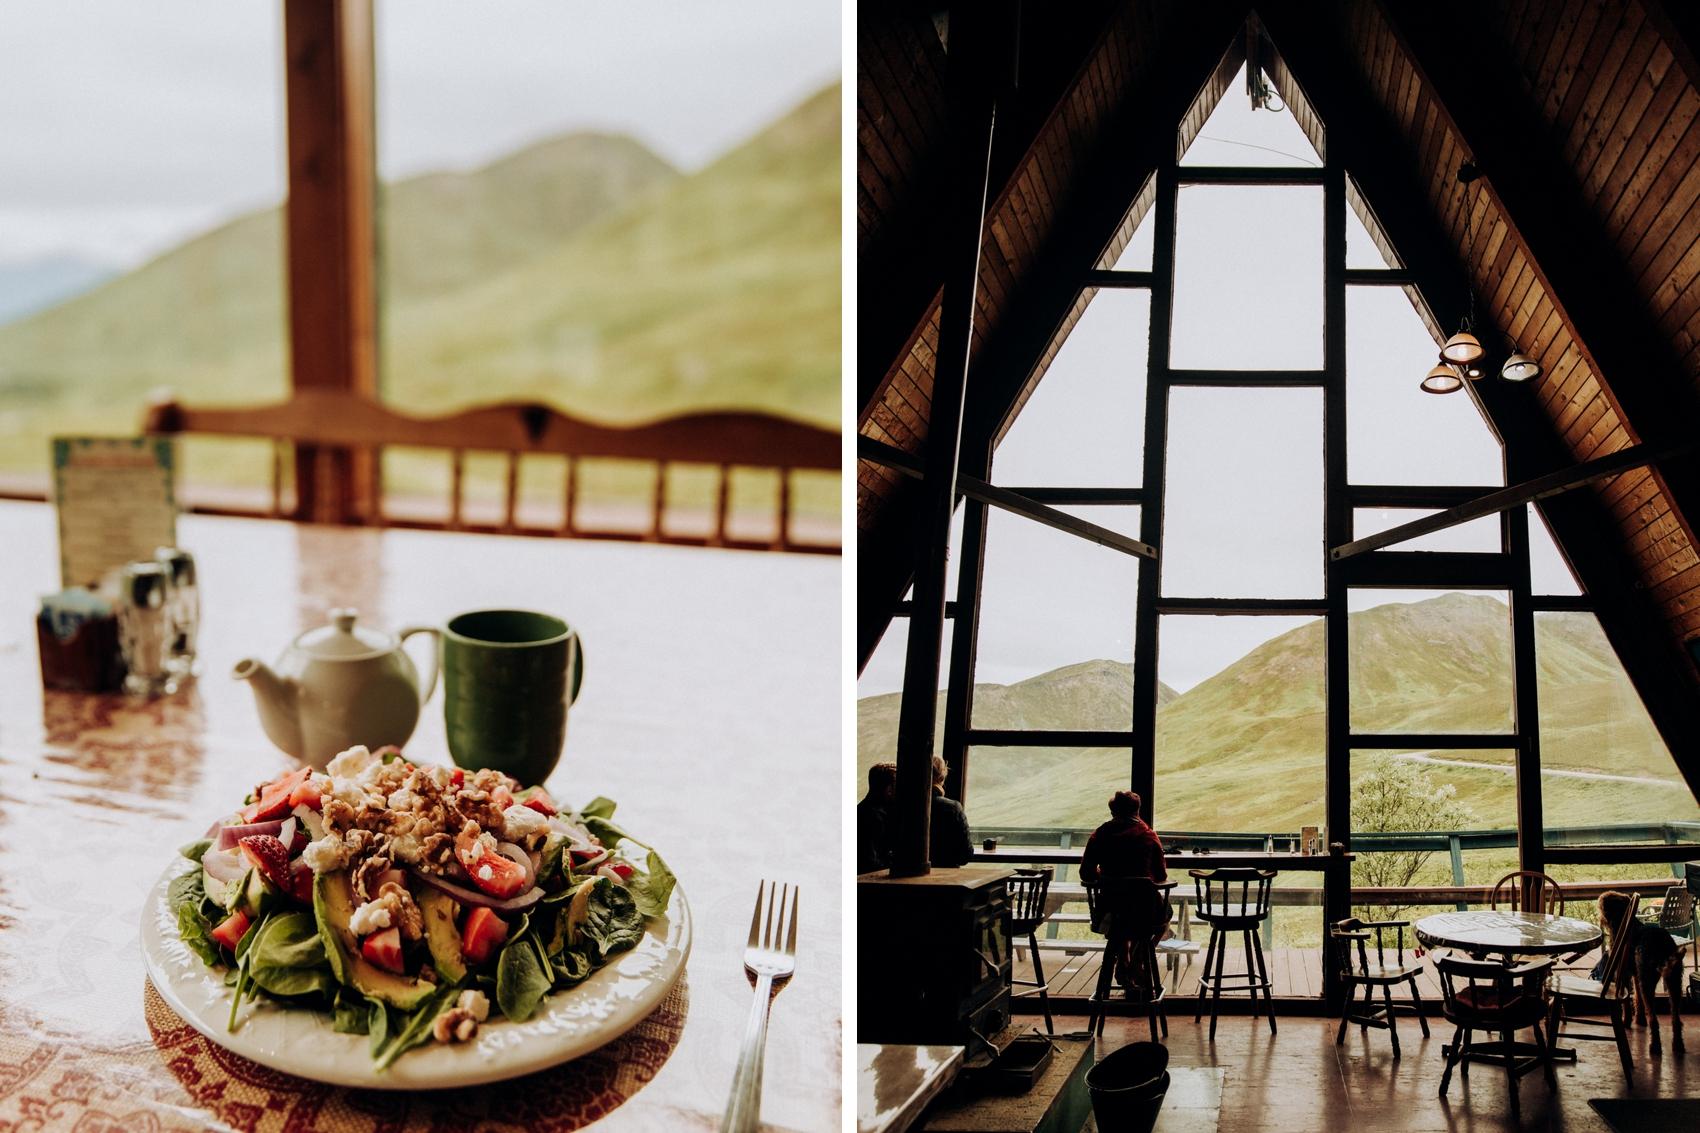 hatcher-pass-ski-lodge-lunch.jpg